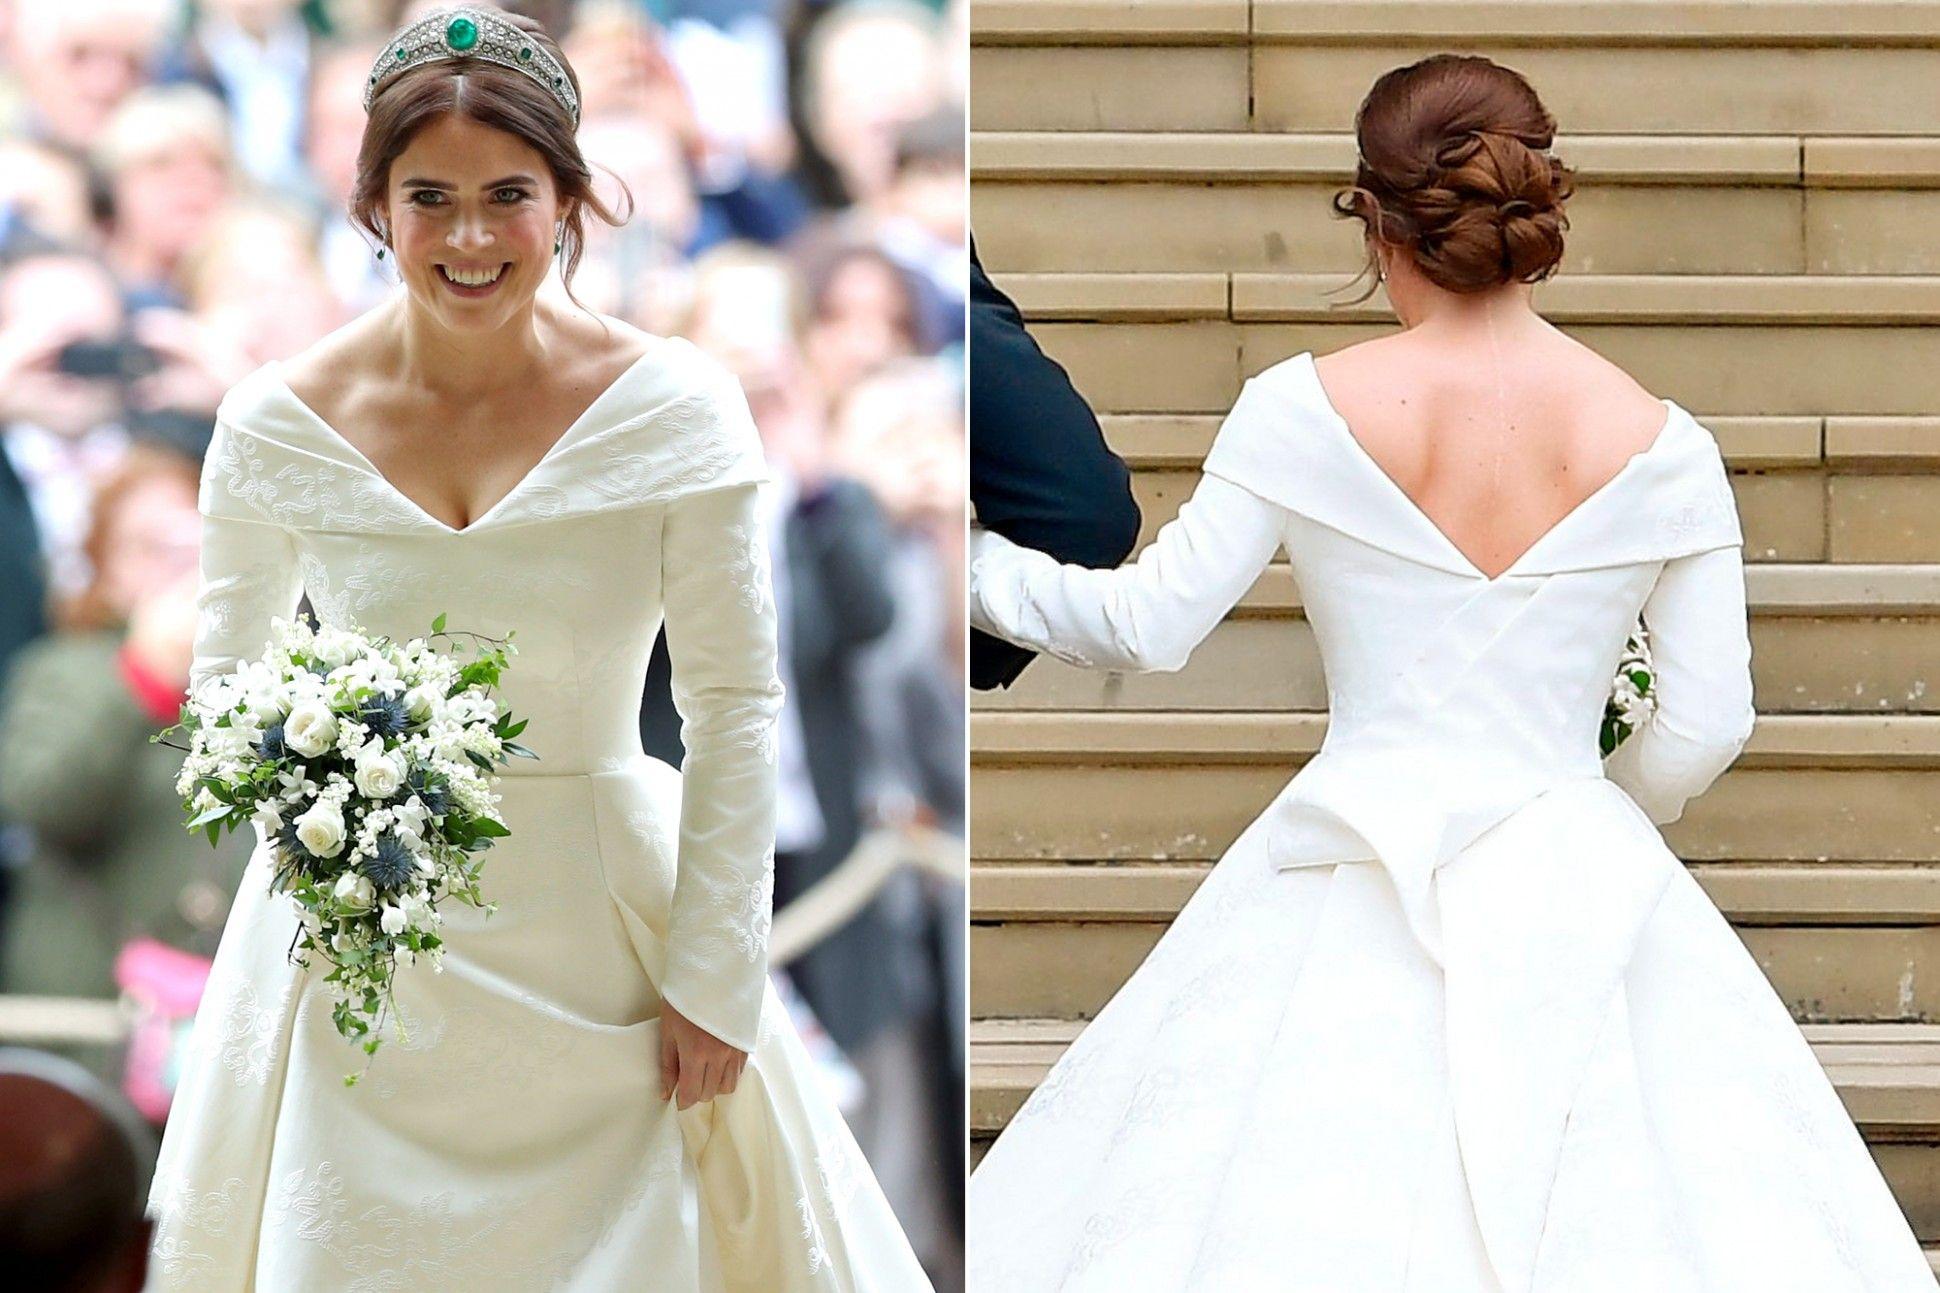 Everything We Know About Princess Beatrice and Edoardo